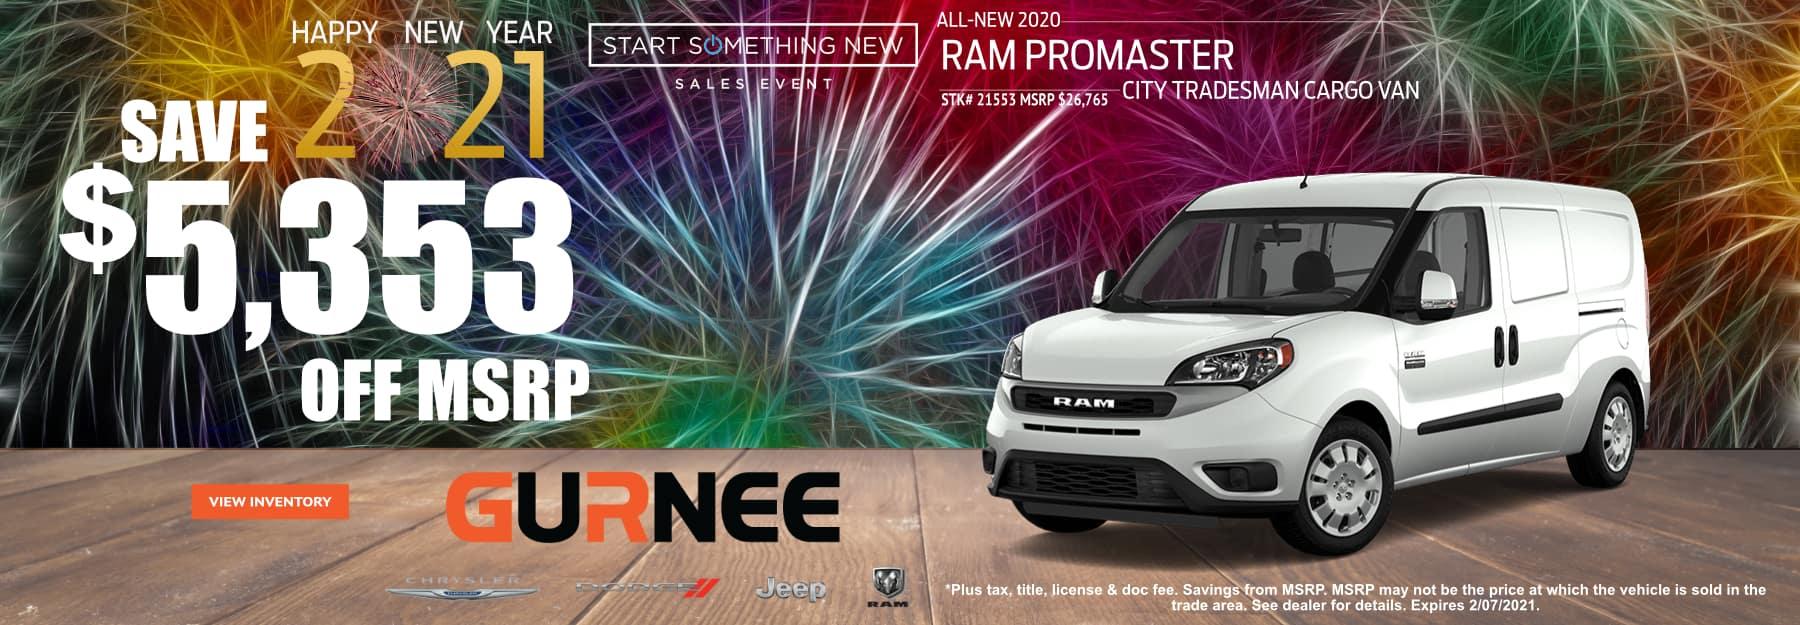 January-2021 RAM_PROMASTER_GURNEE